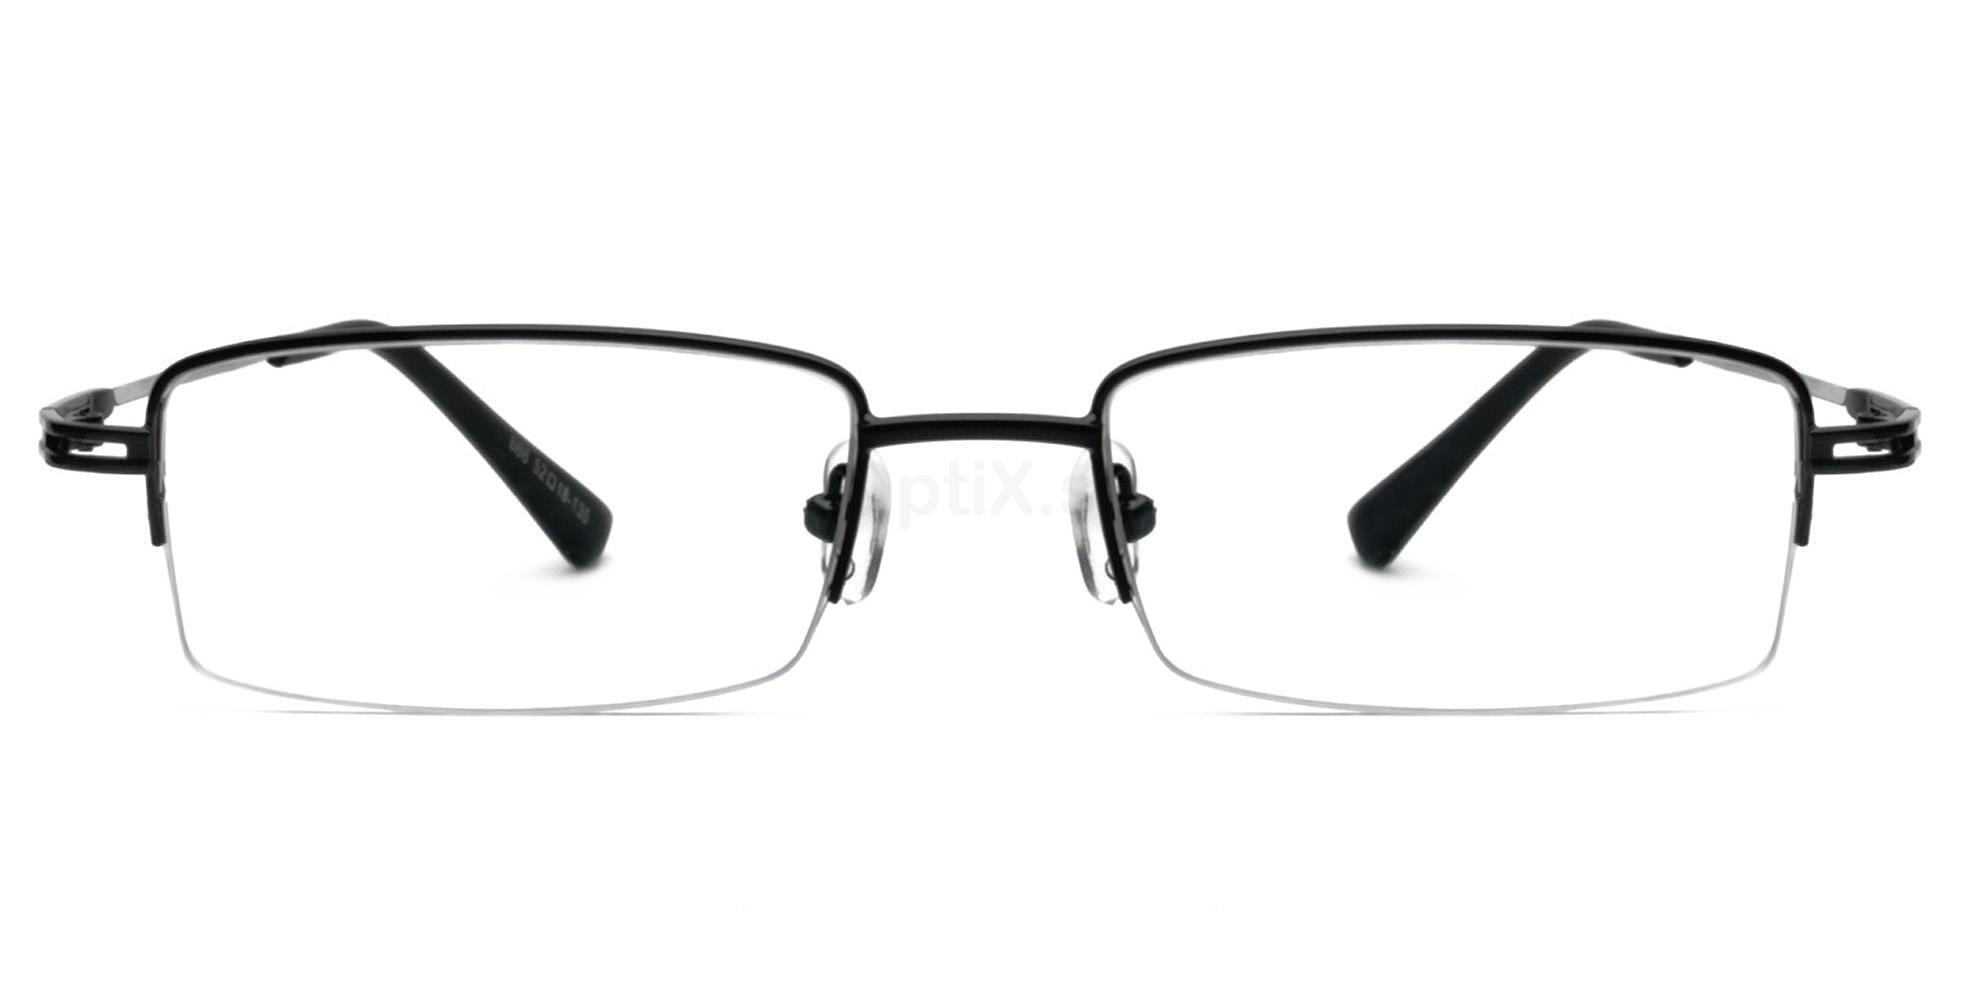 Black 666 Glasses, Infinity